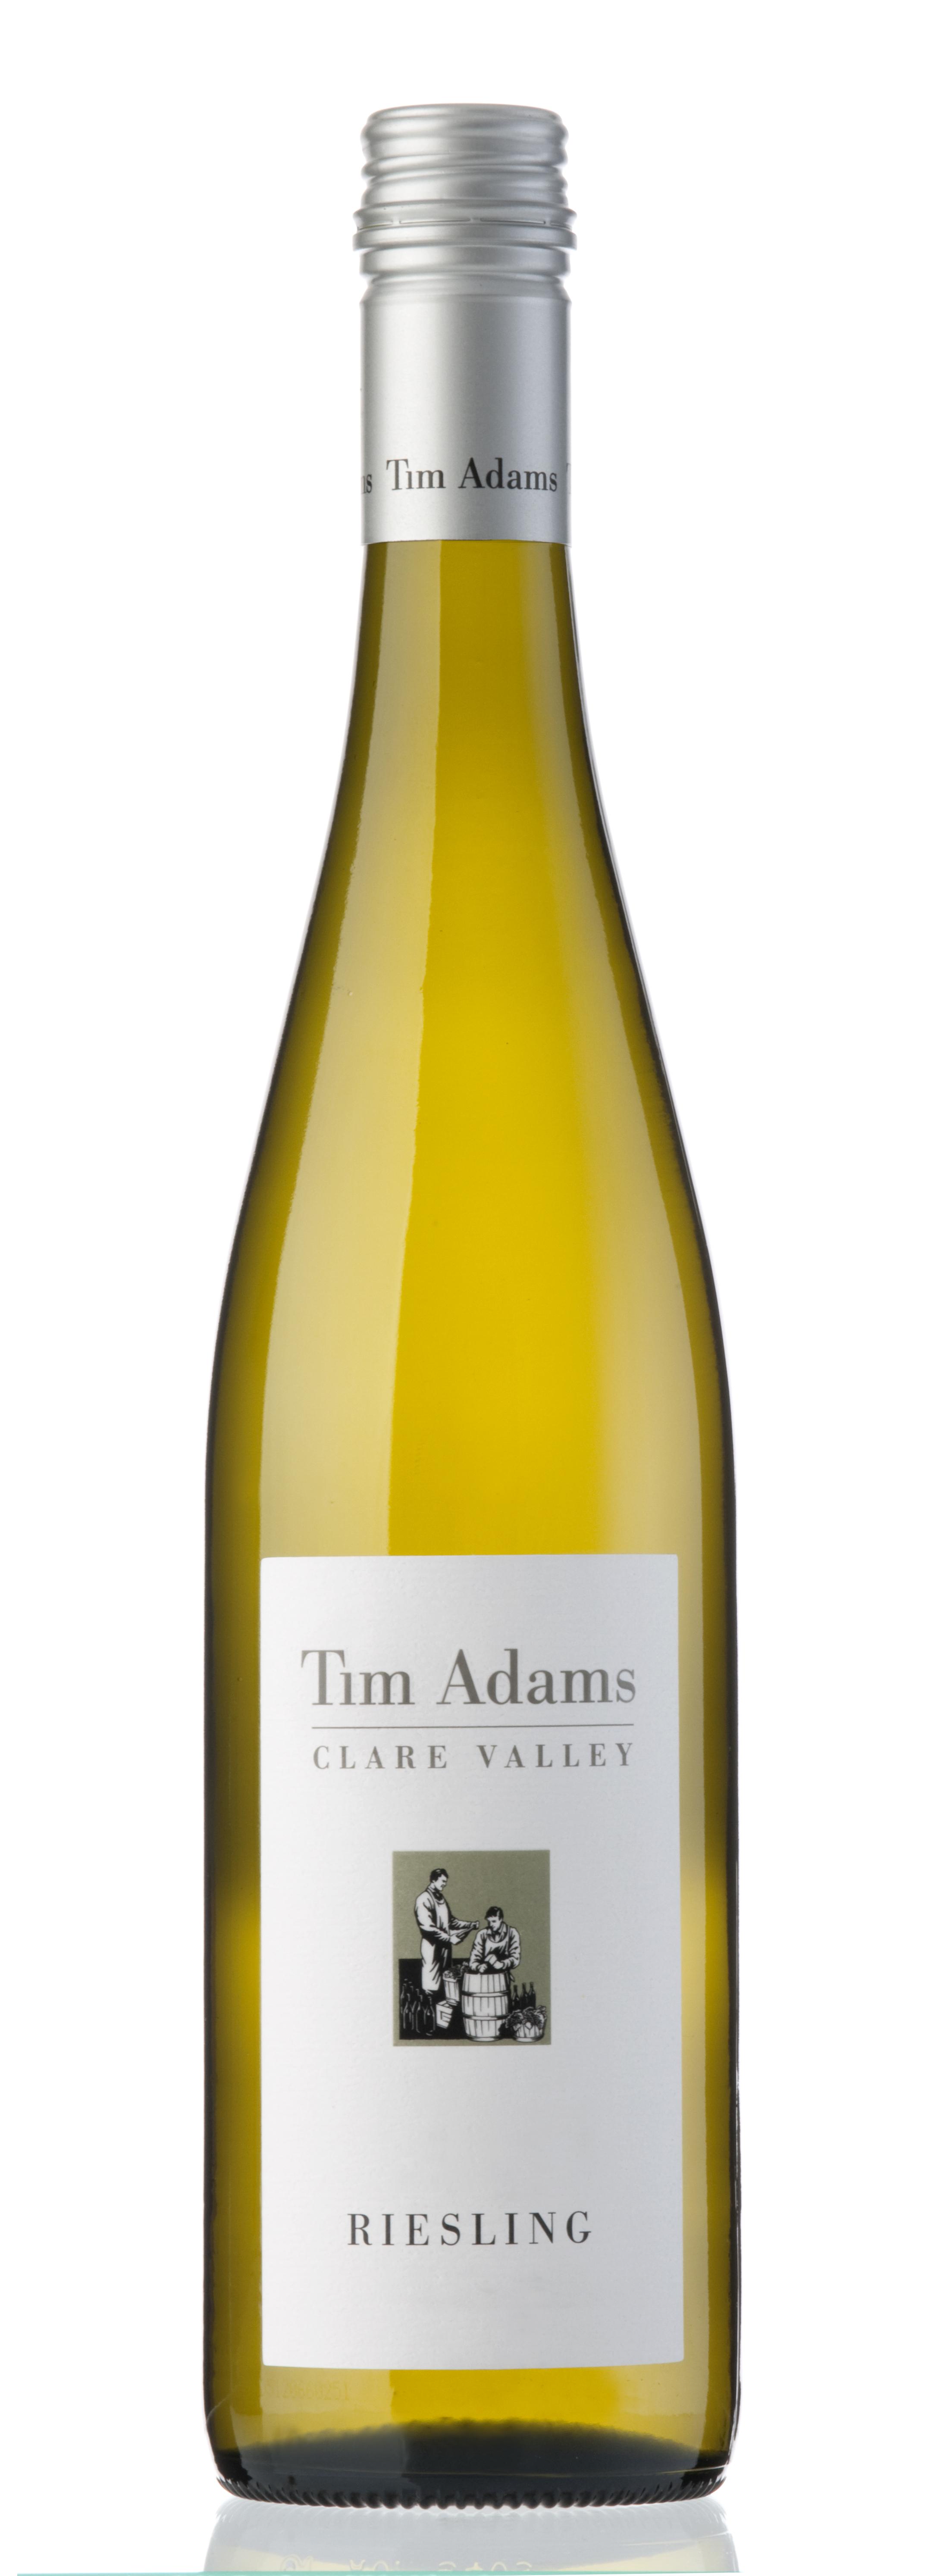 Tim Adams Riesling